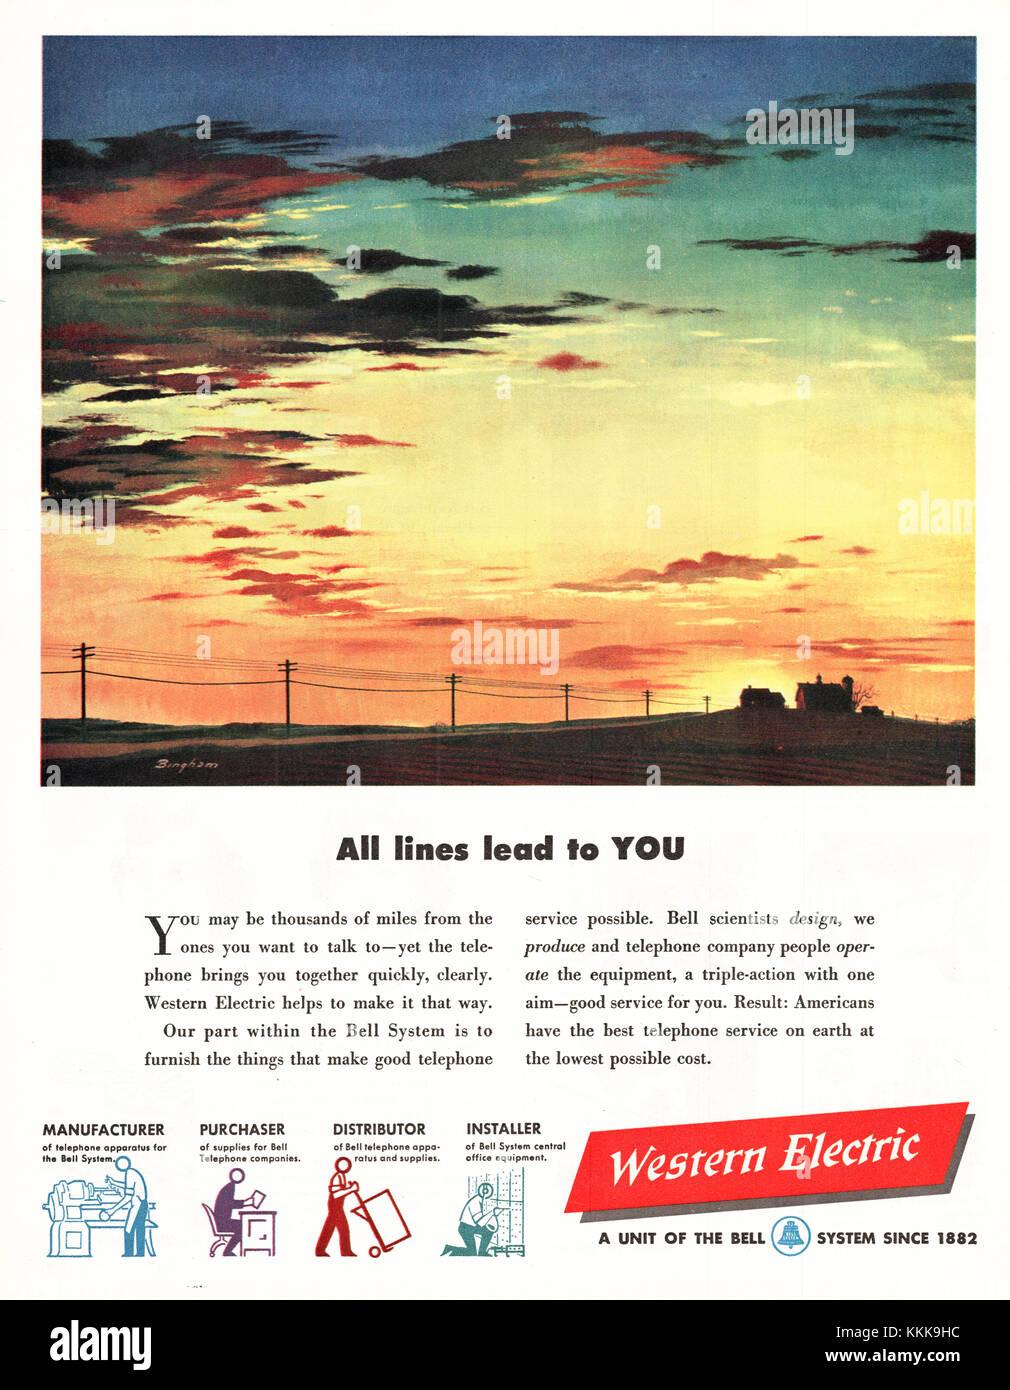 1949 U.S. Magazine Western Electric Advert - Stock Image